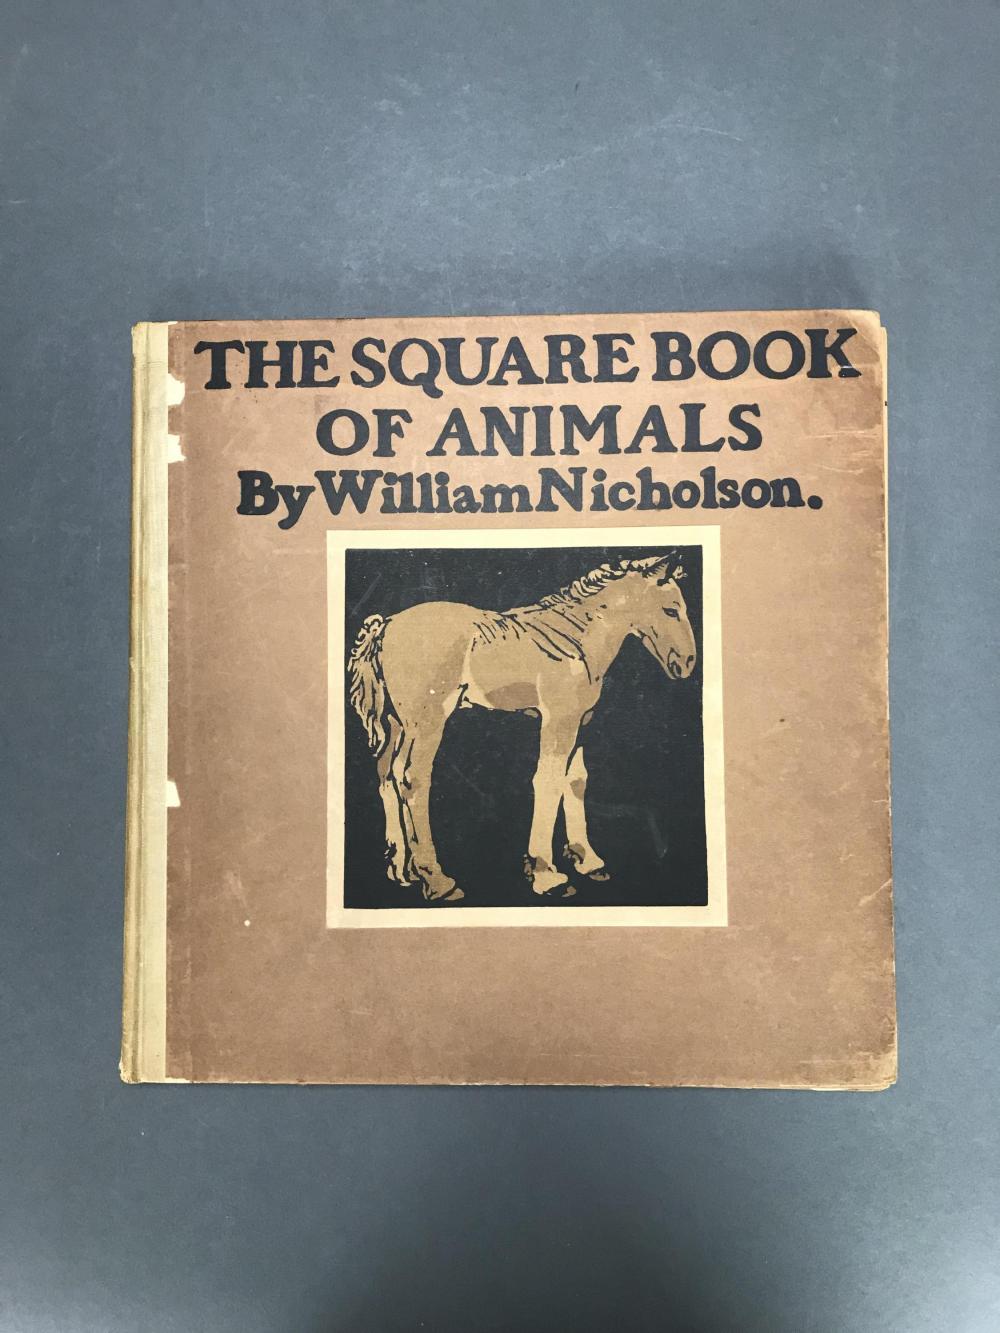 Lot 250: Nicholson. The Square Book of Animals. 1900.